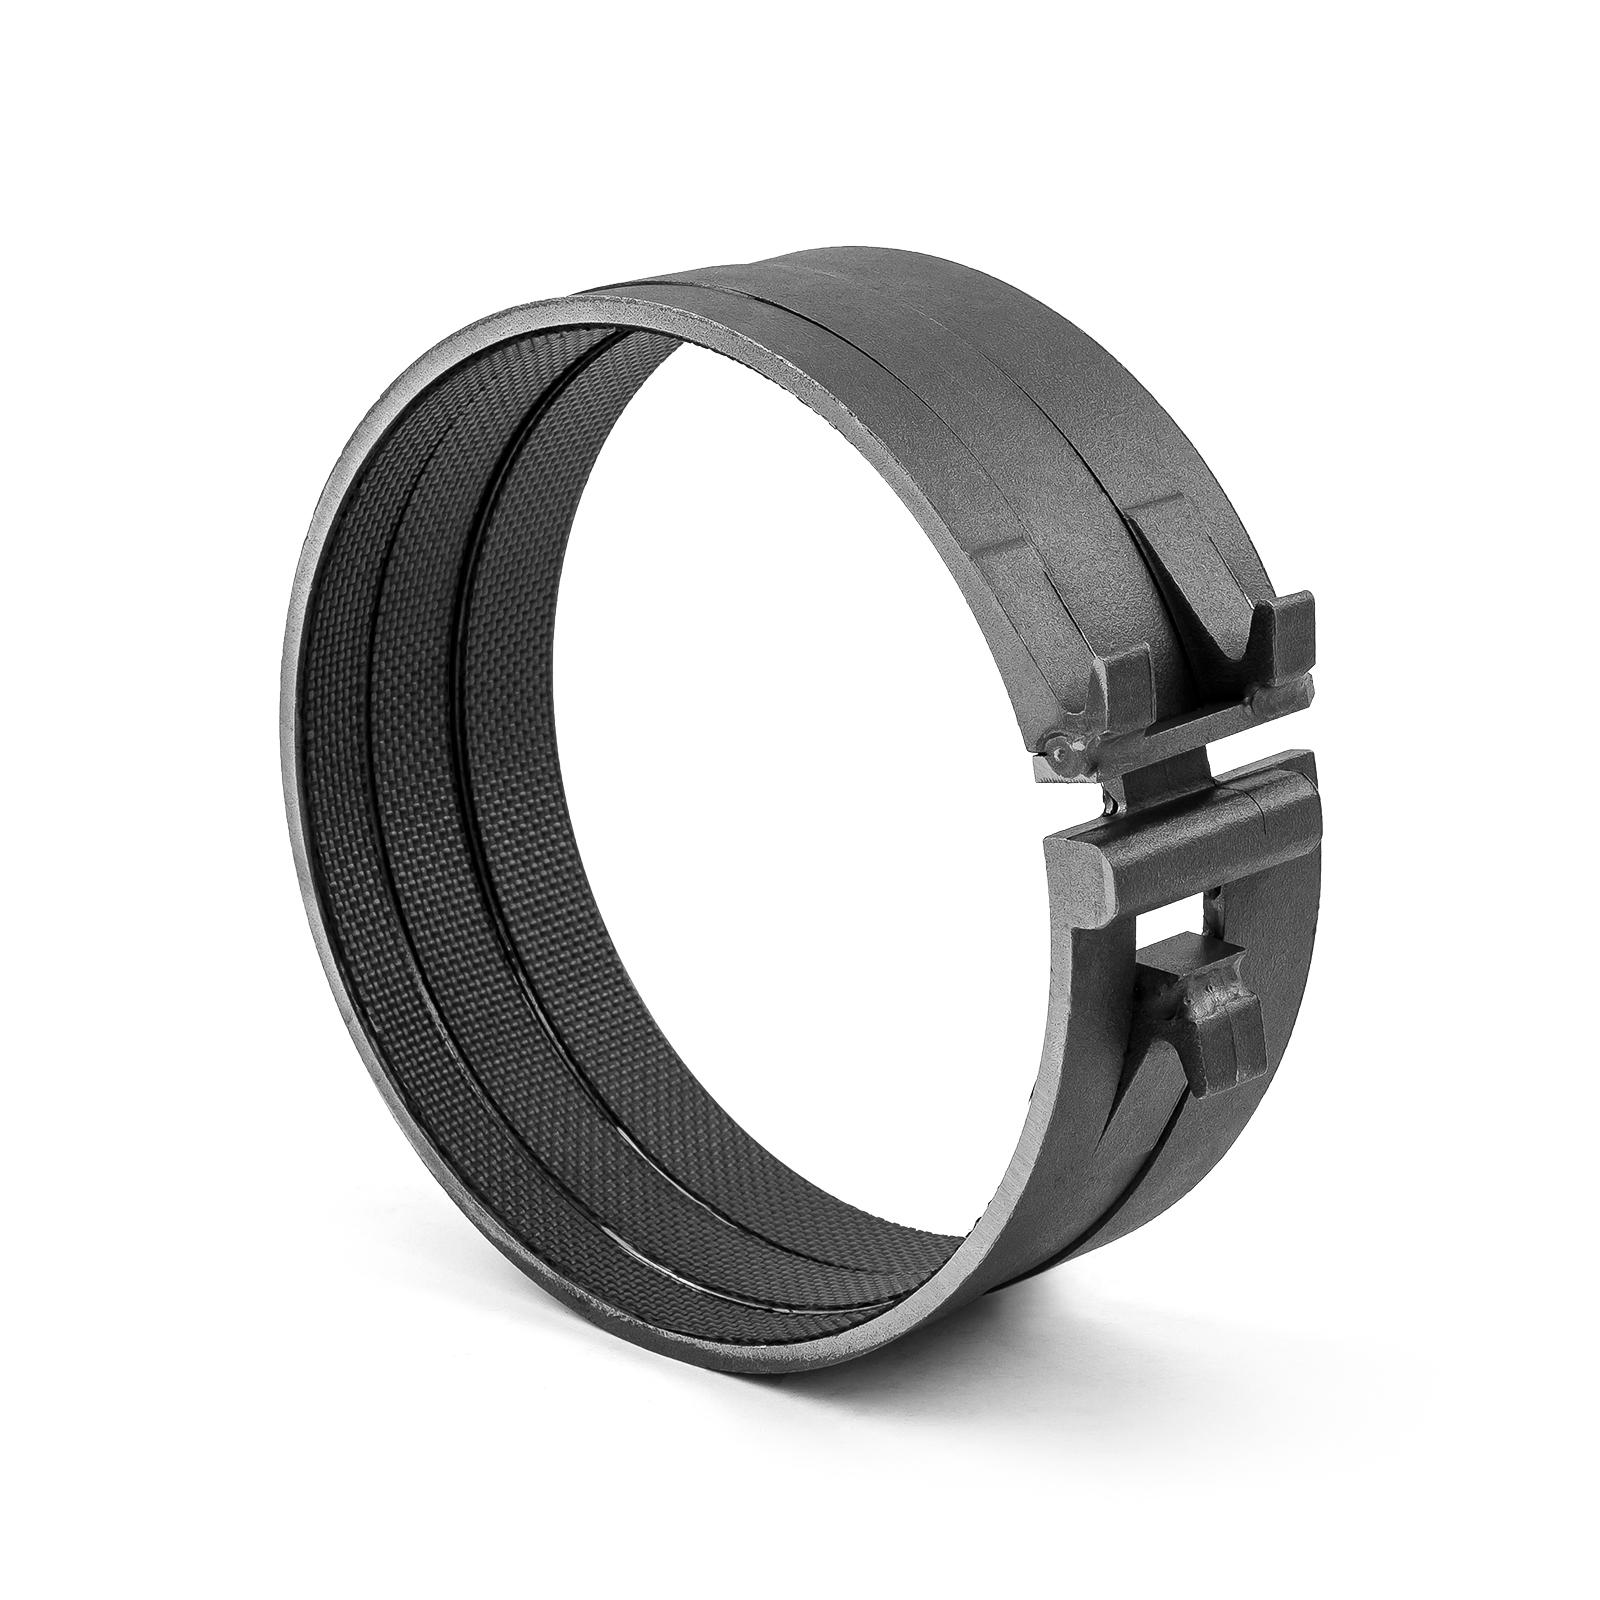 GM Powerglide Low Gear Carbon Fiber Band